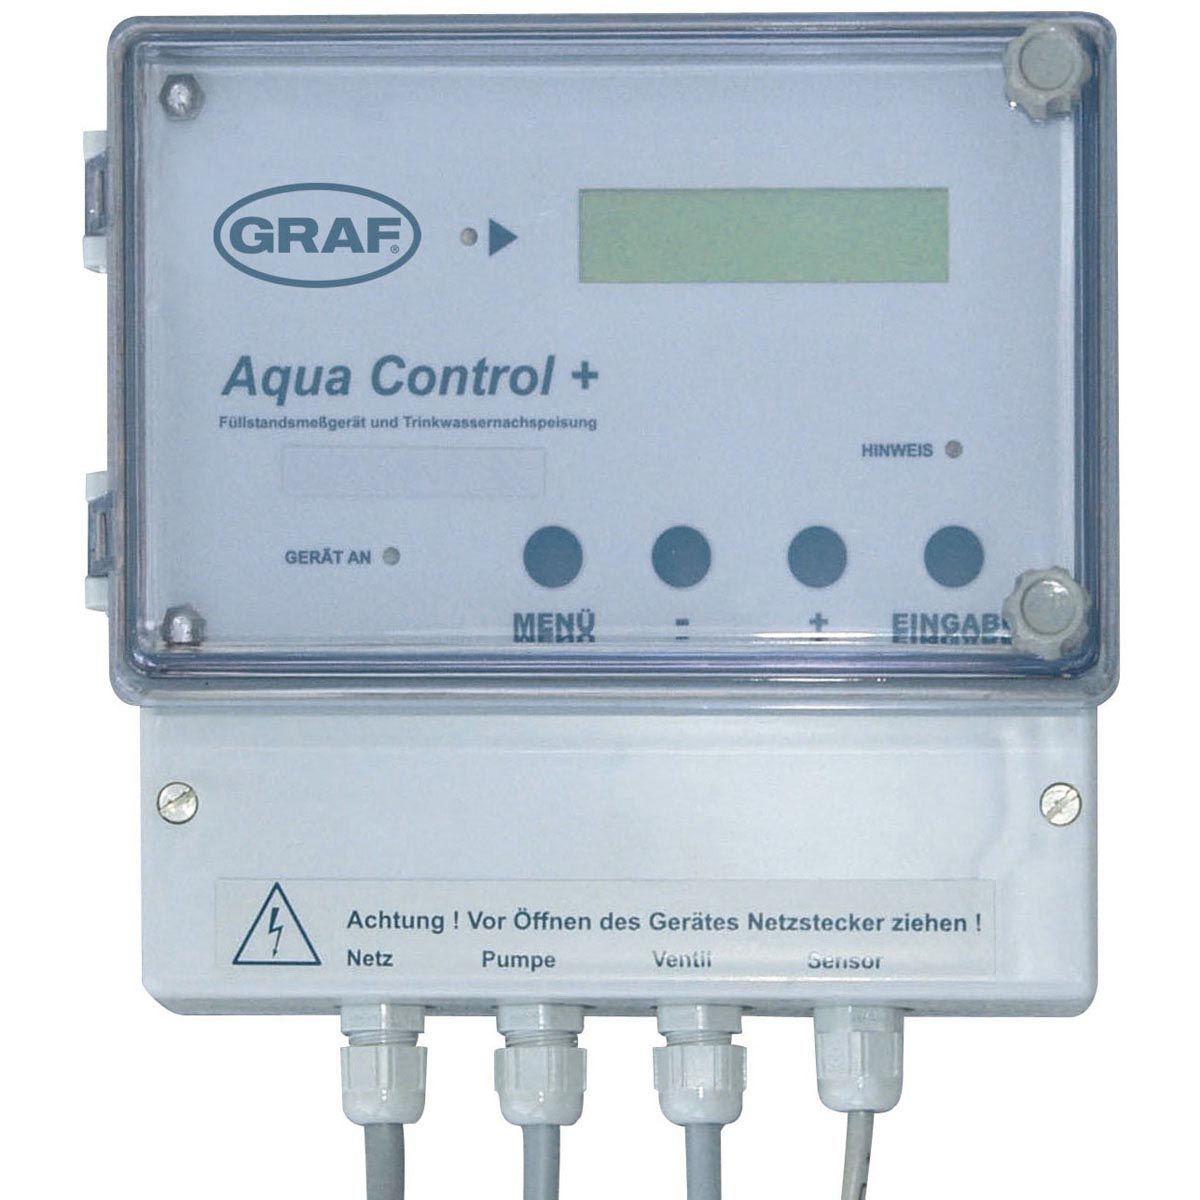 Wasserstandmesser, Aqua-Control+,